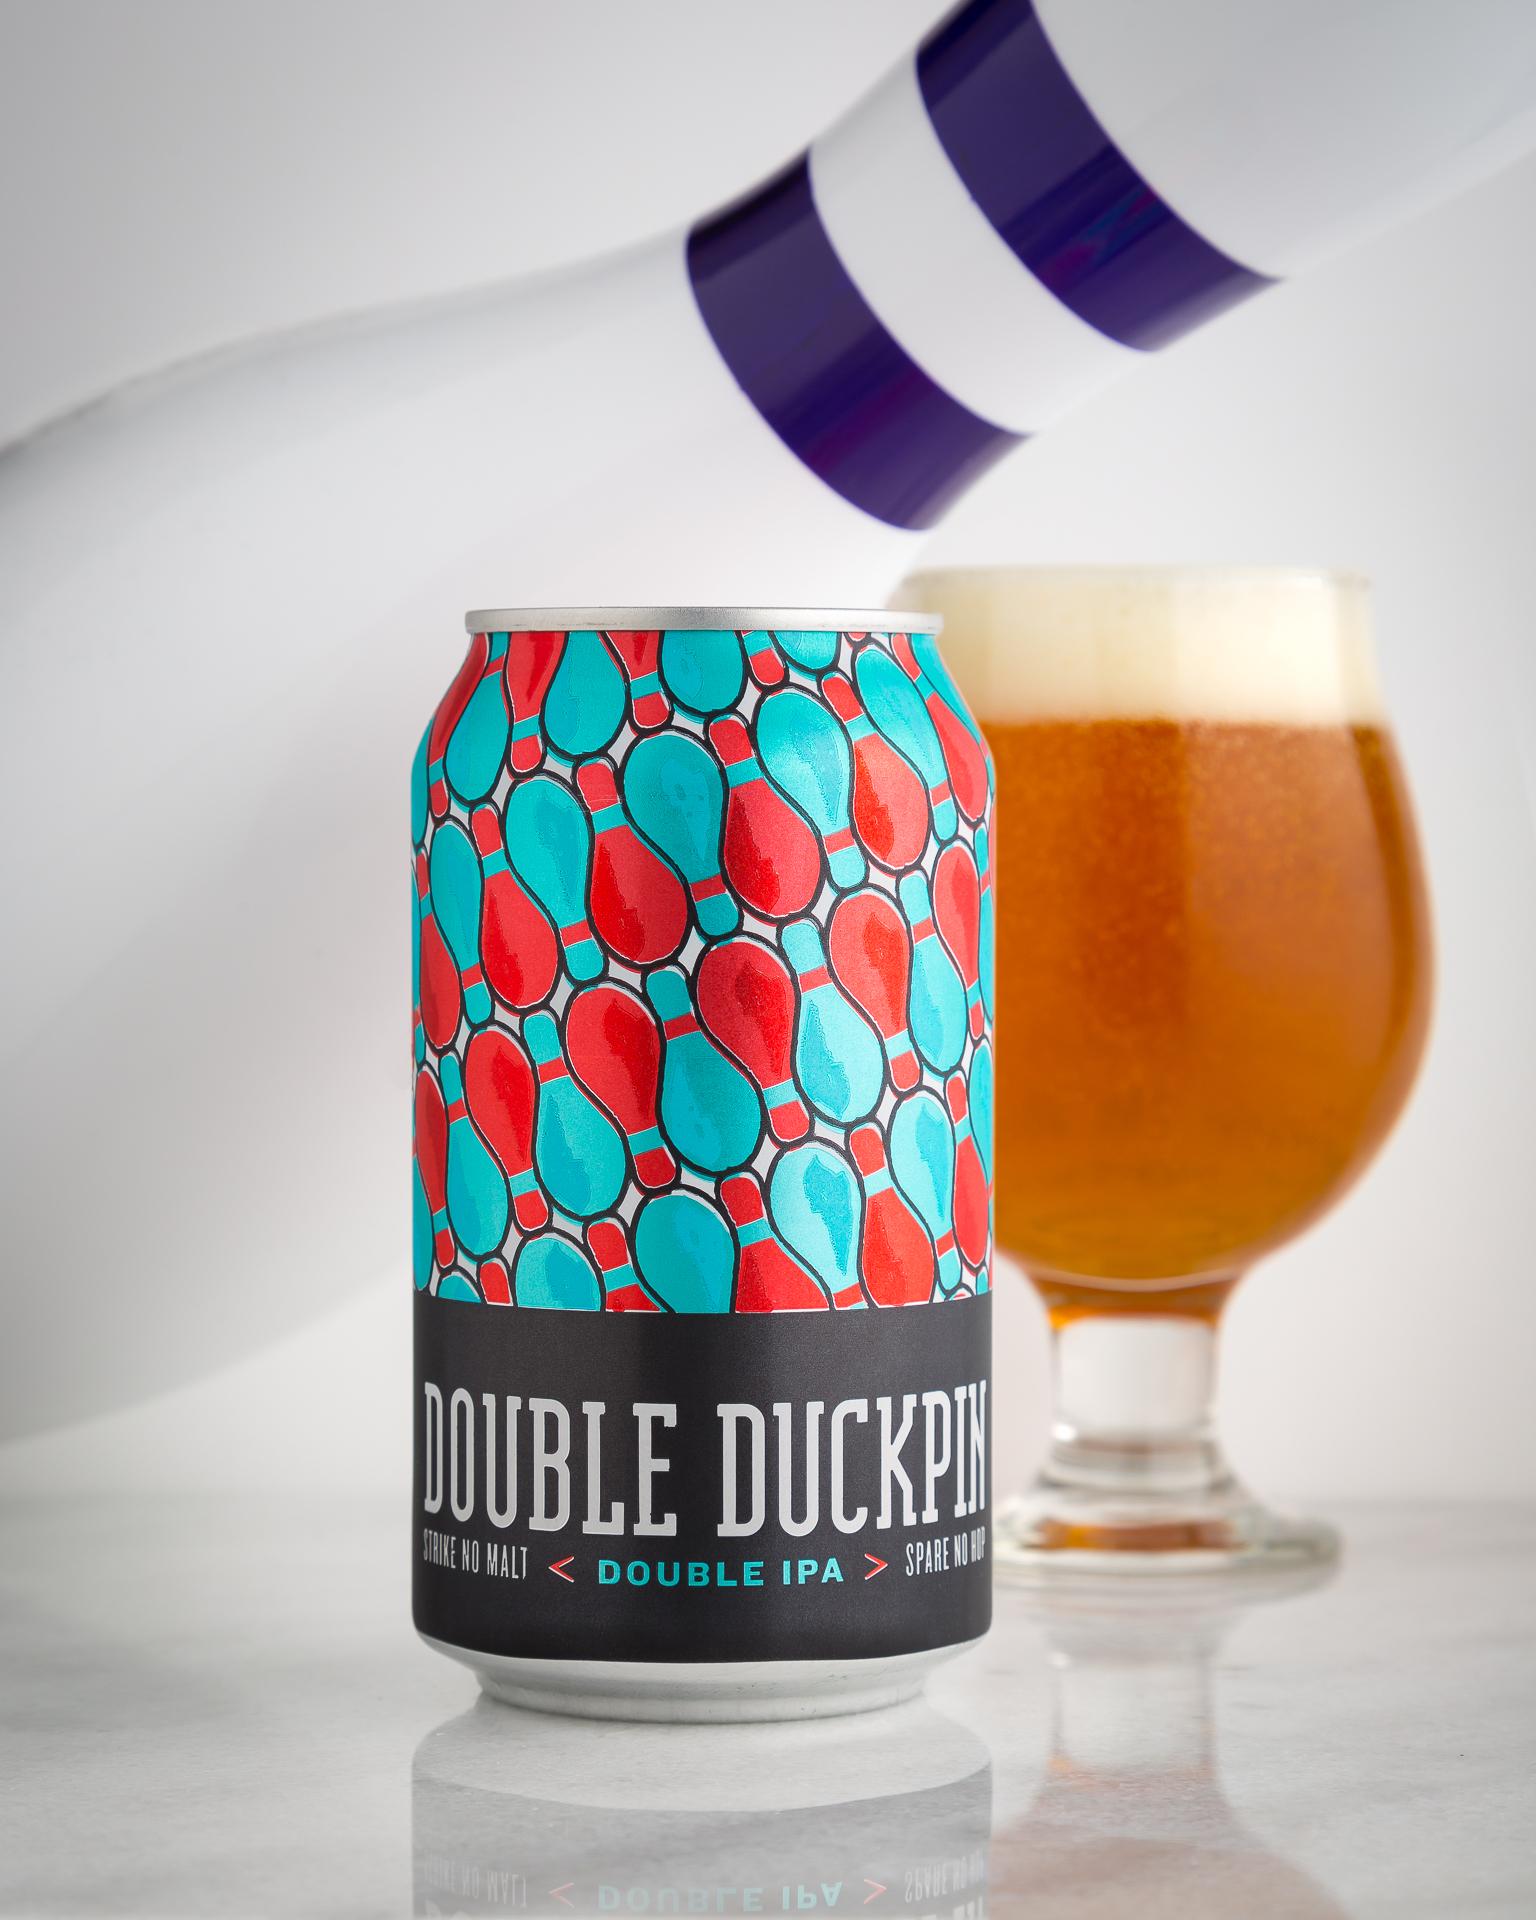 Double_Duckpin.jpg